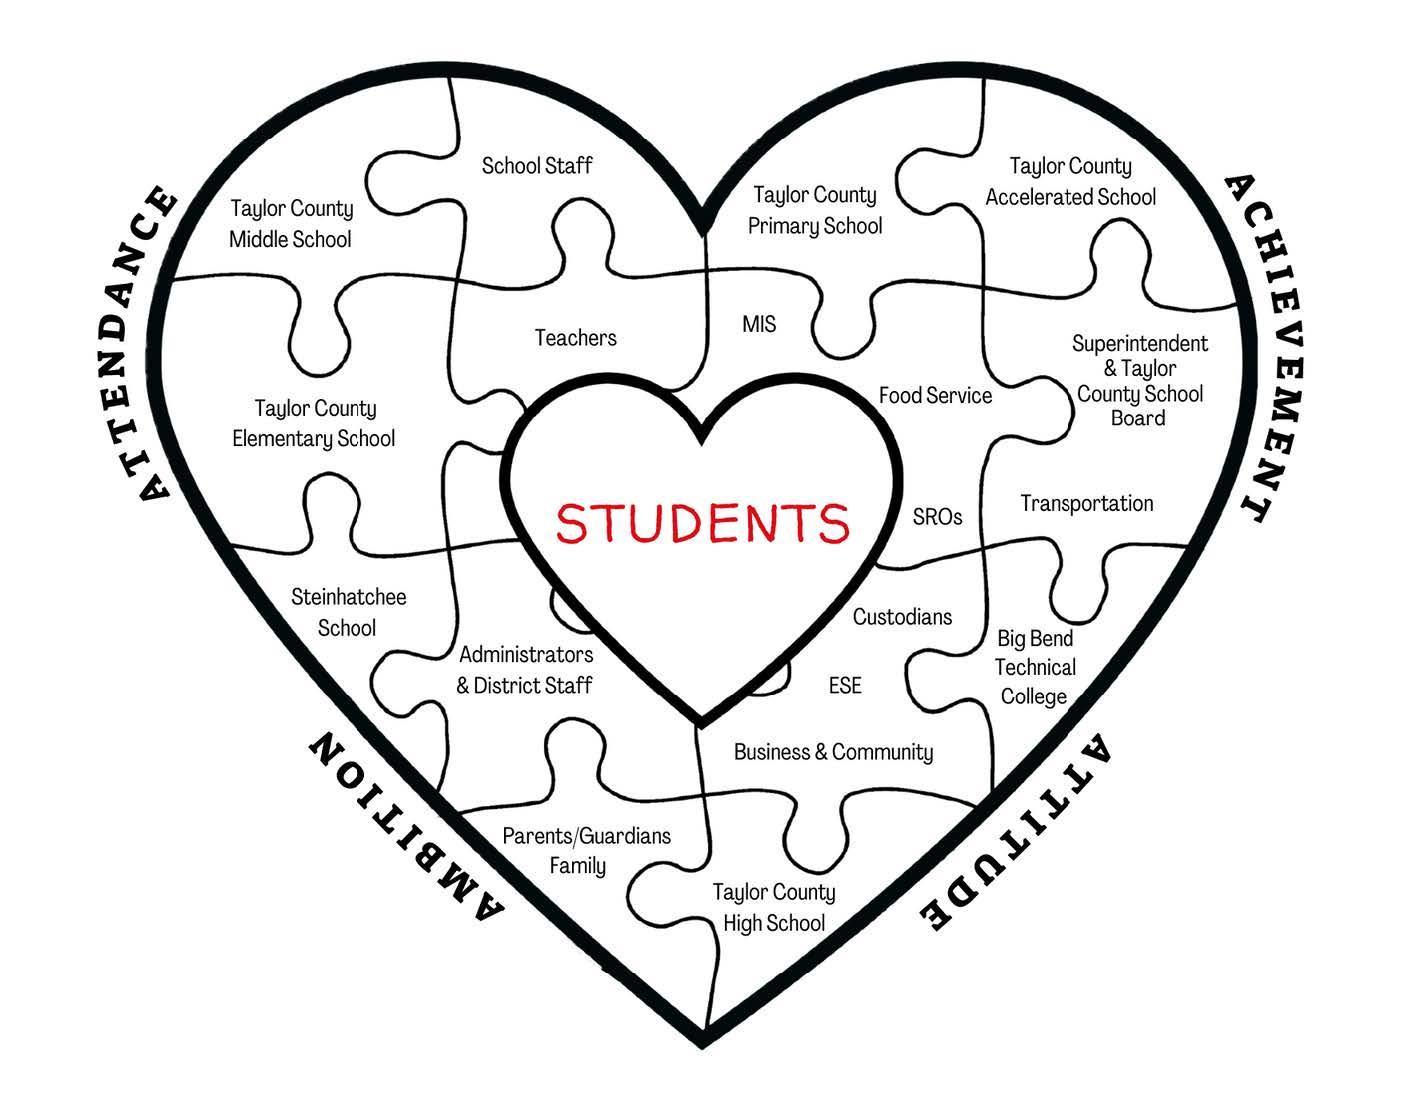 Student Heart